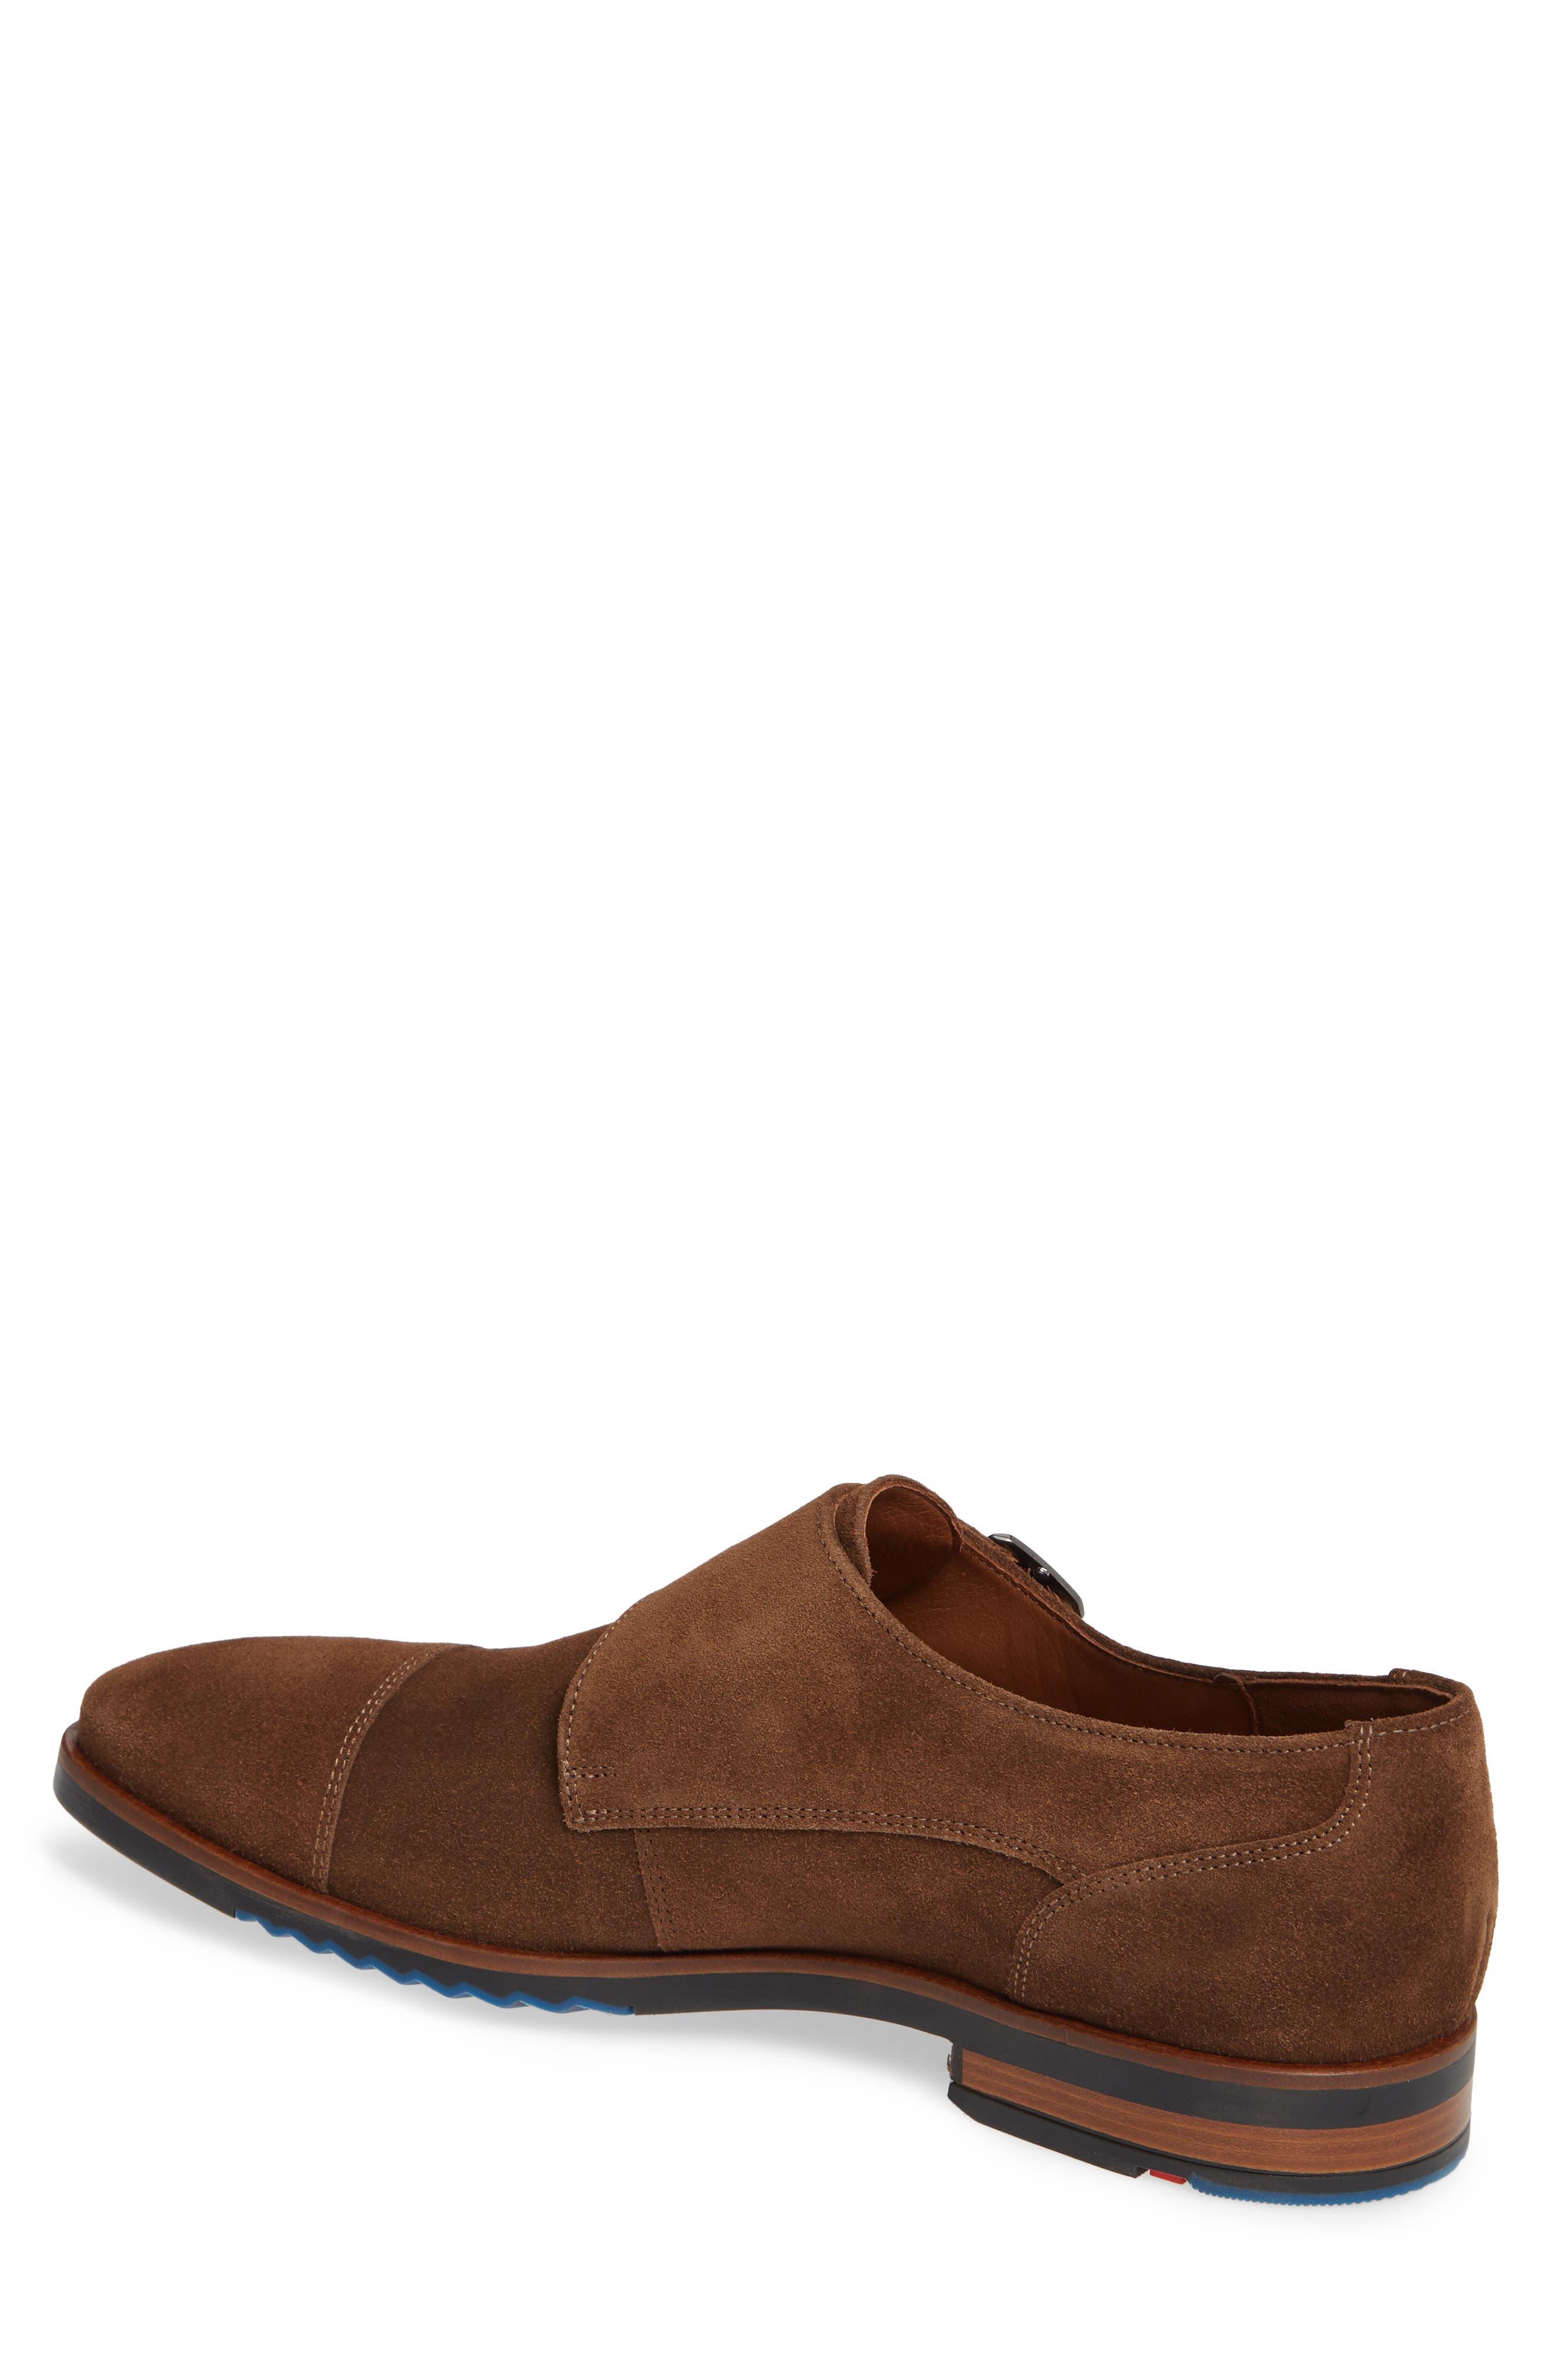 Darrow Double Monk Strap Shoe,                             Alternate thumbnail 2, color,                             CIGAR BROWN SUEDE